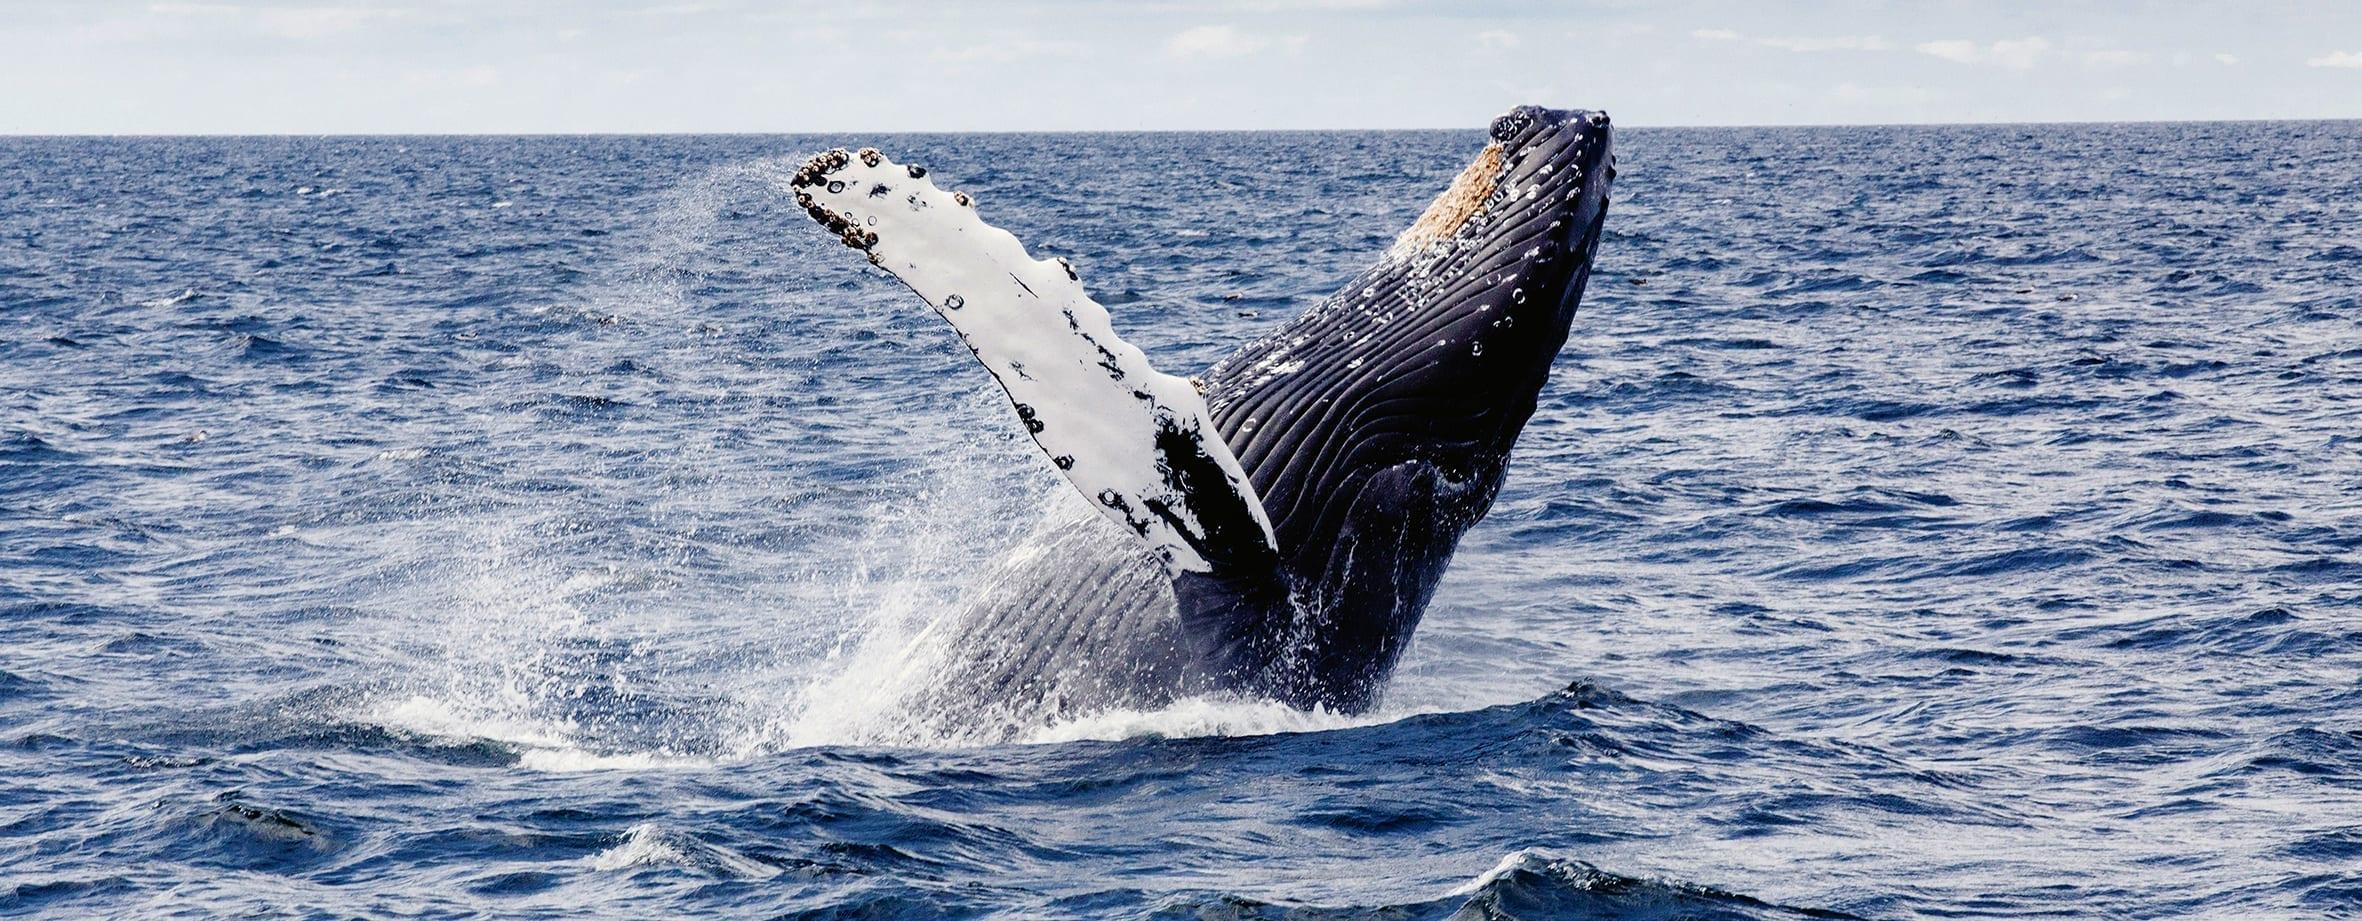 Humpback whale, T. Kelley